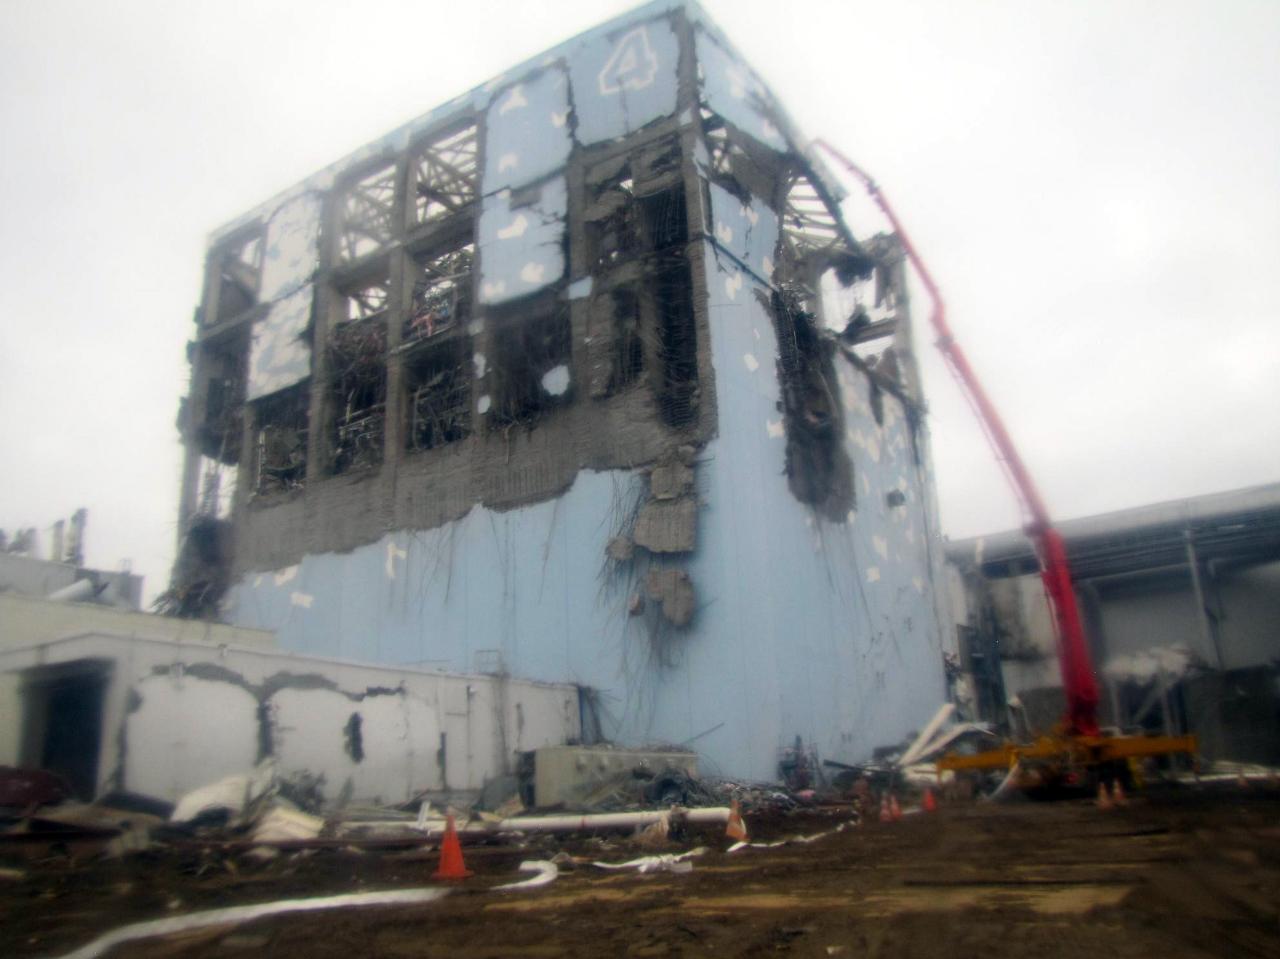 Verwoesten kernreactor Fukushima Unit 4